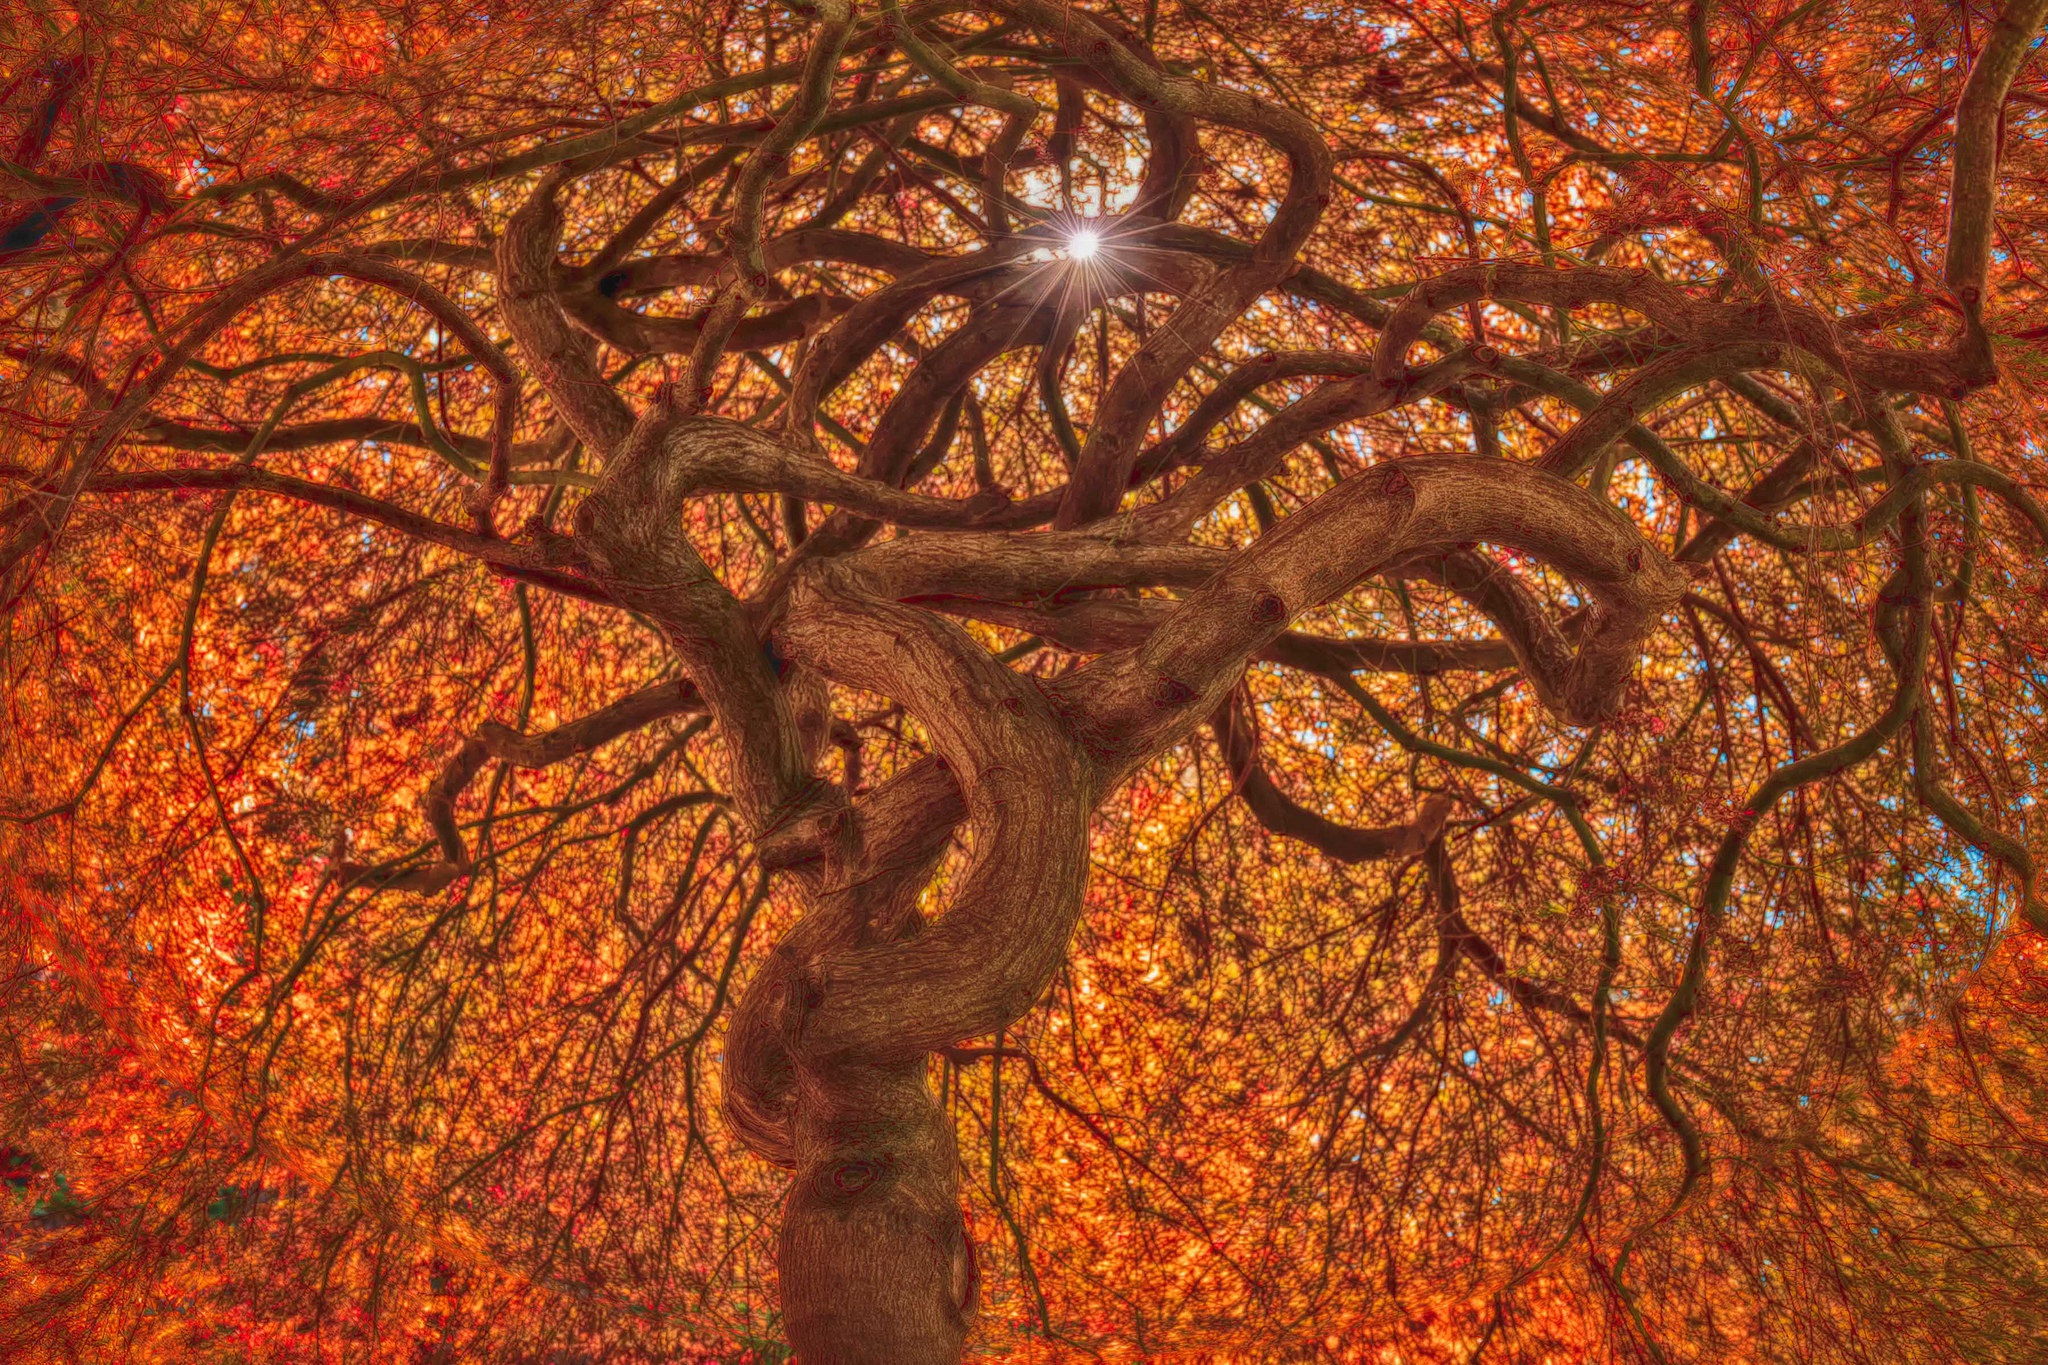 Nature Branch Fall Foliage Twisted Tree 2048x1365